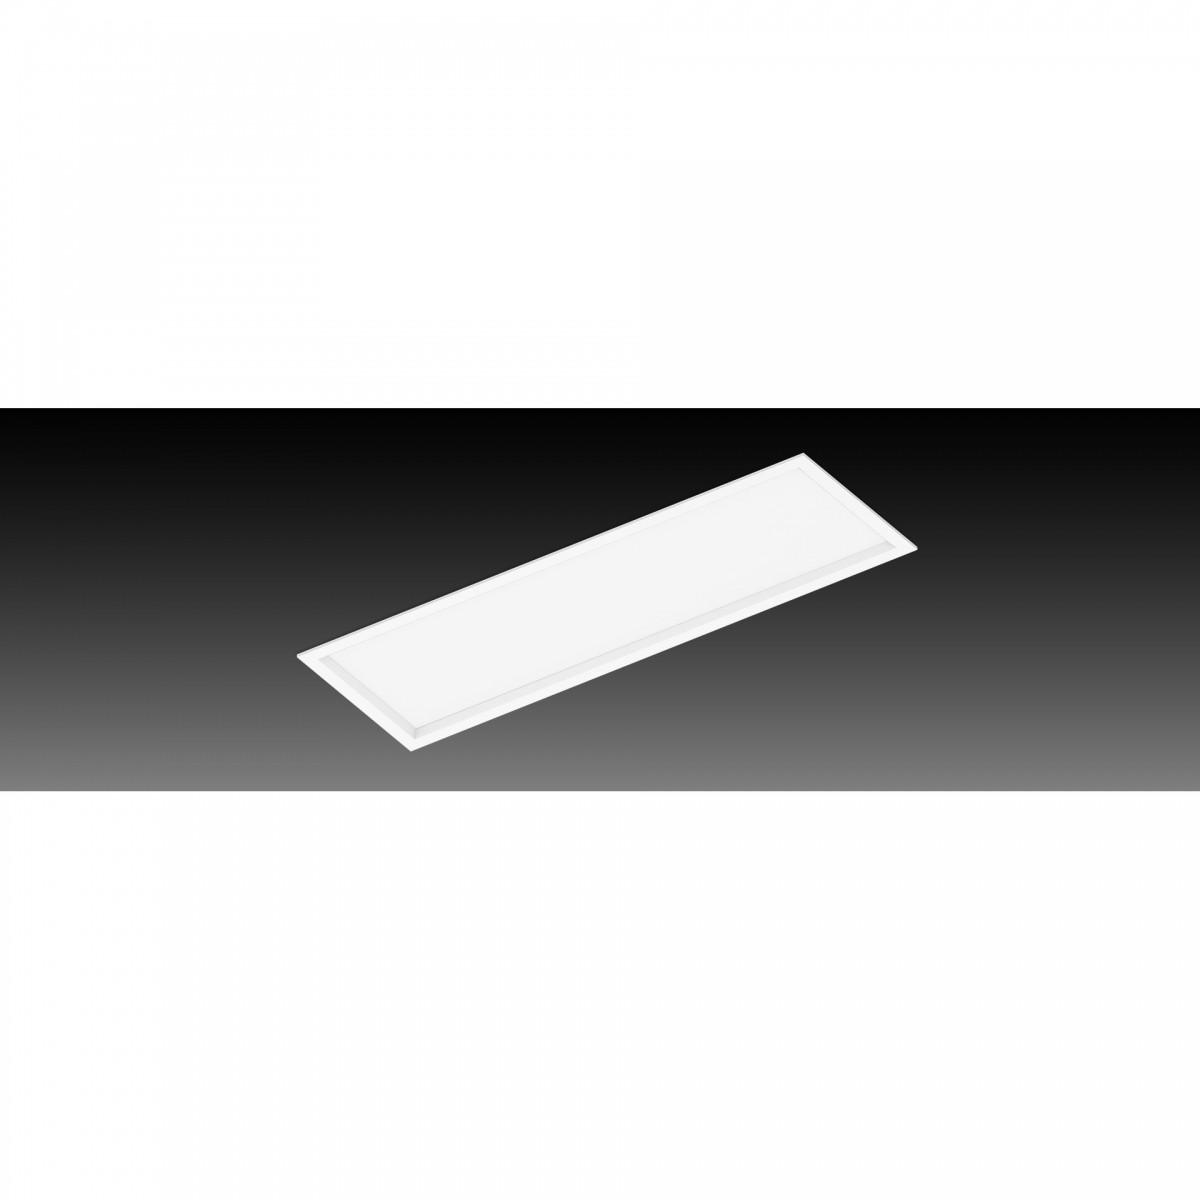 Luminária de Embutir 2x14W Branca - Interlight